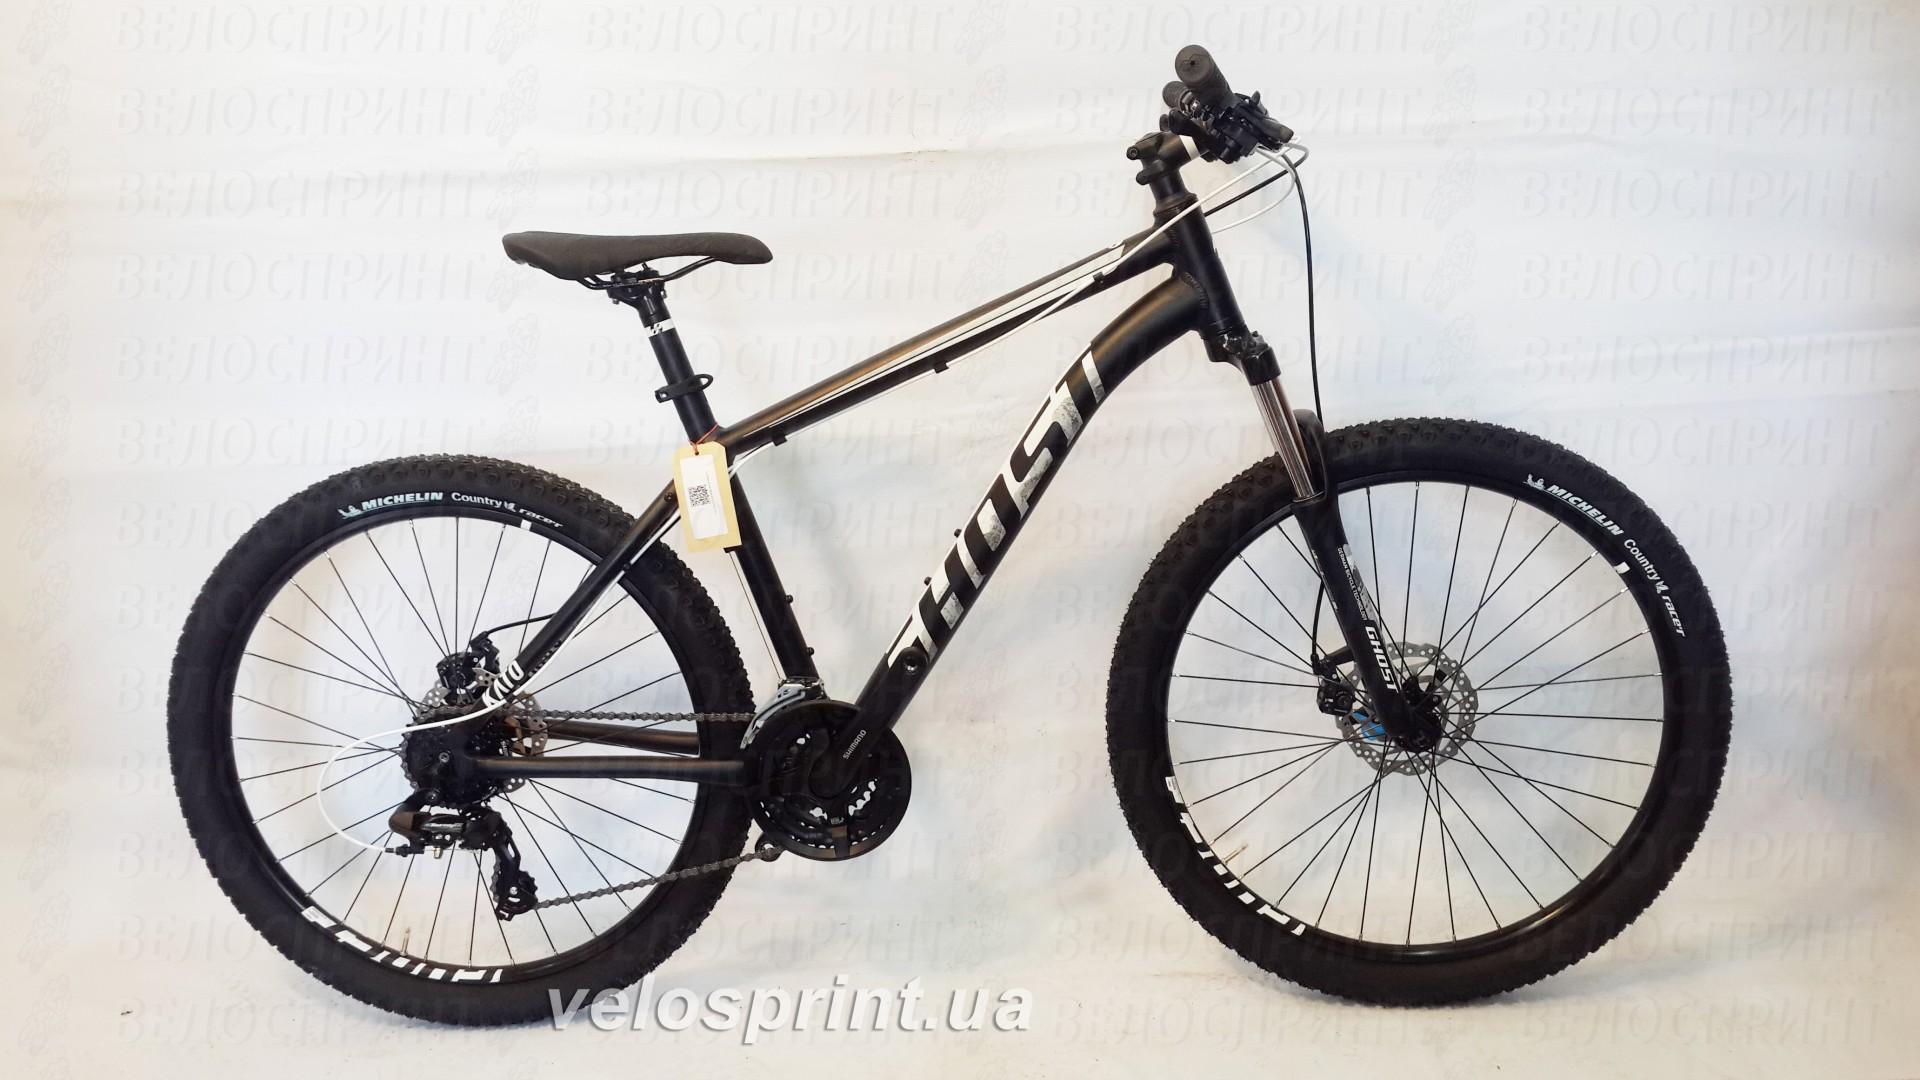 Велосипед GHOST Kato 1 AL 26 nightblack/starwhite общий вид год 2017